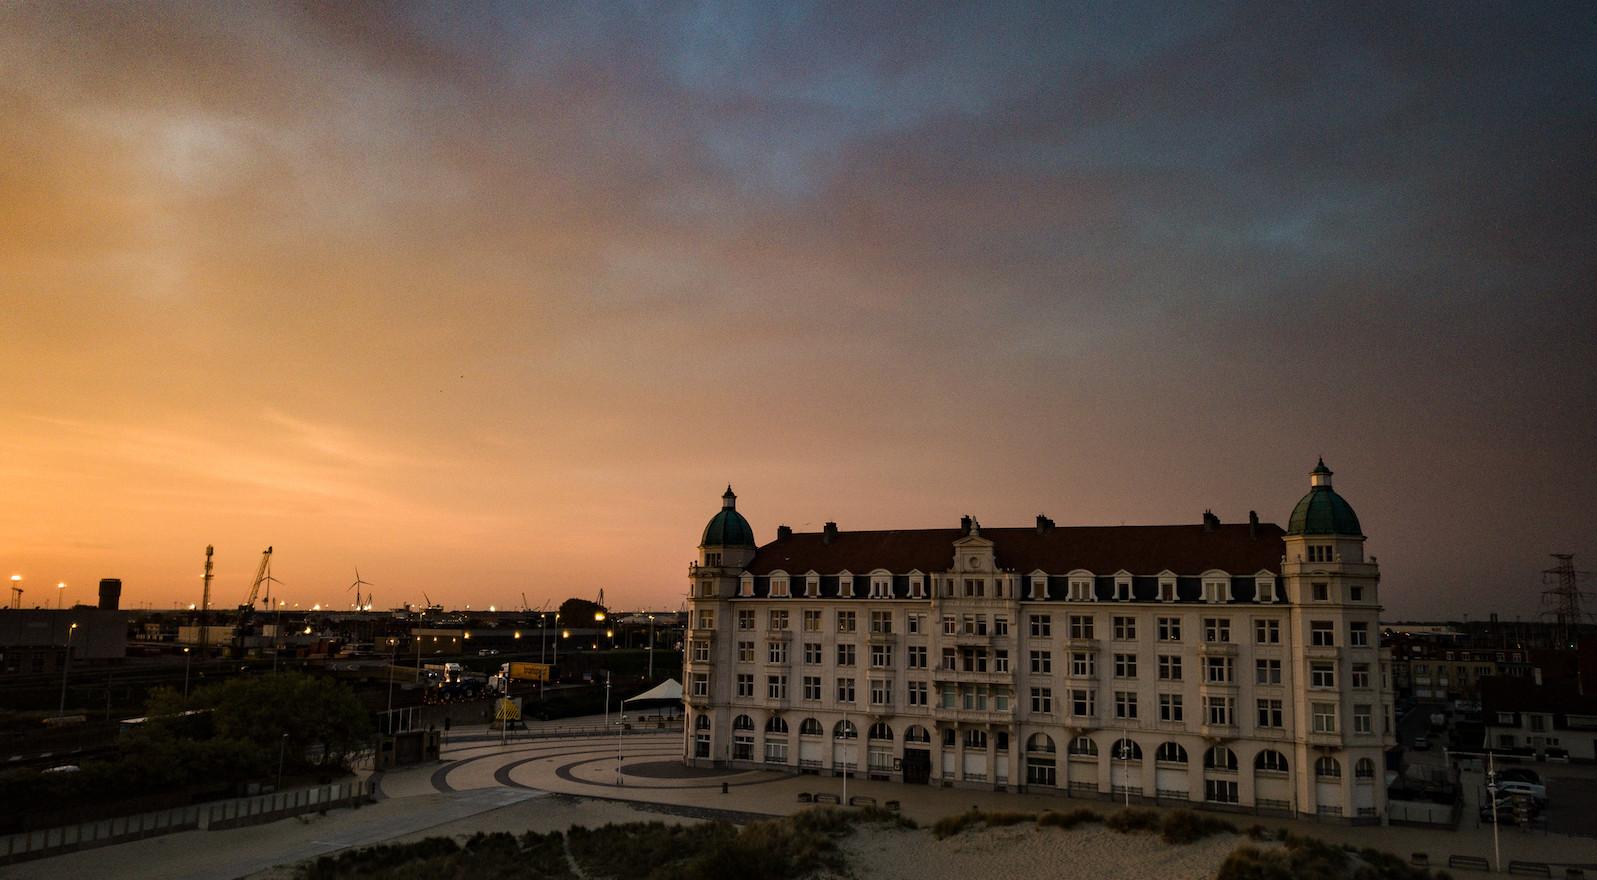 2019Apr23 Zeebrugge morning [M]11.JPG